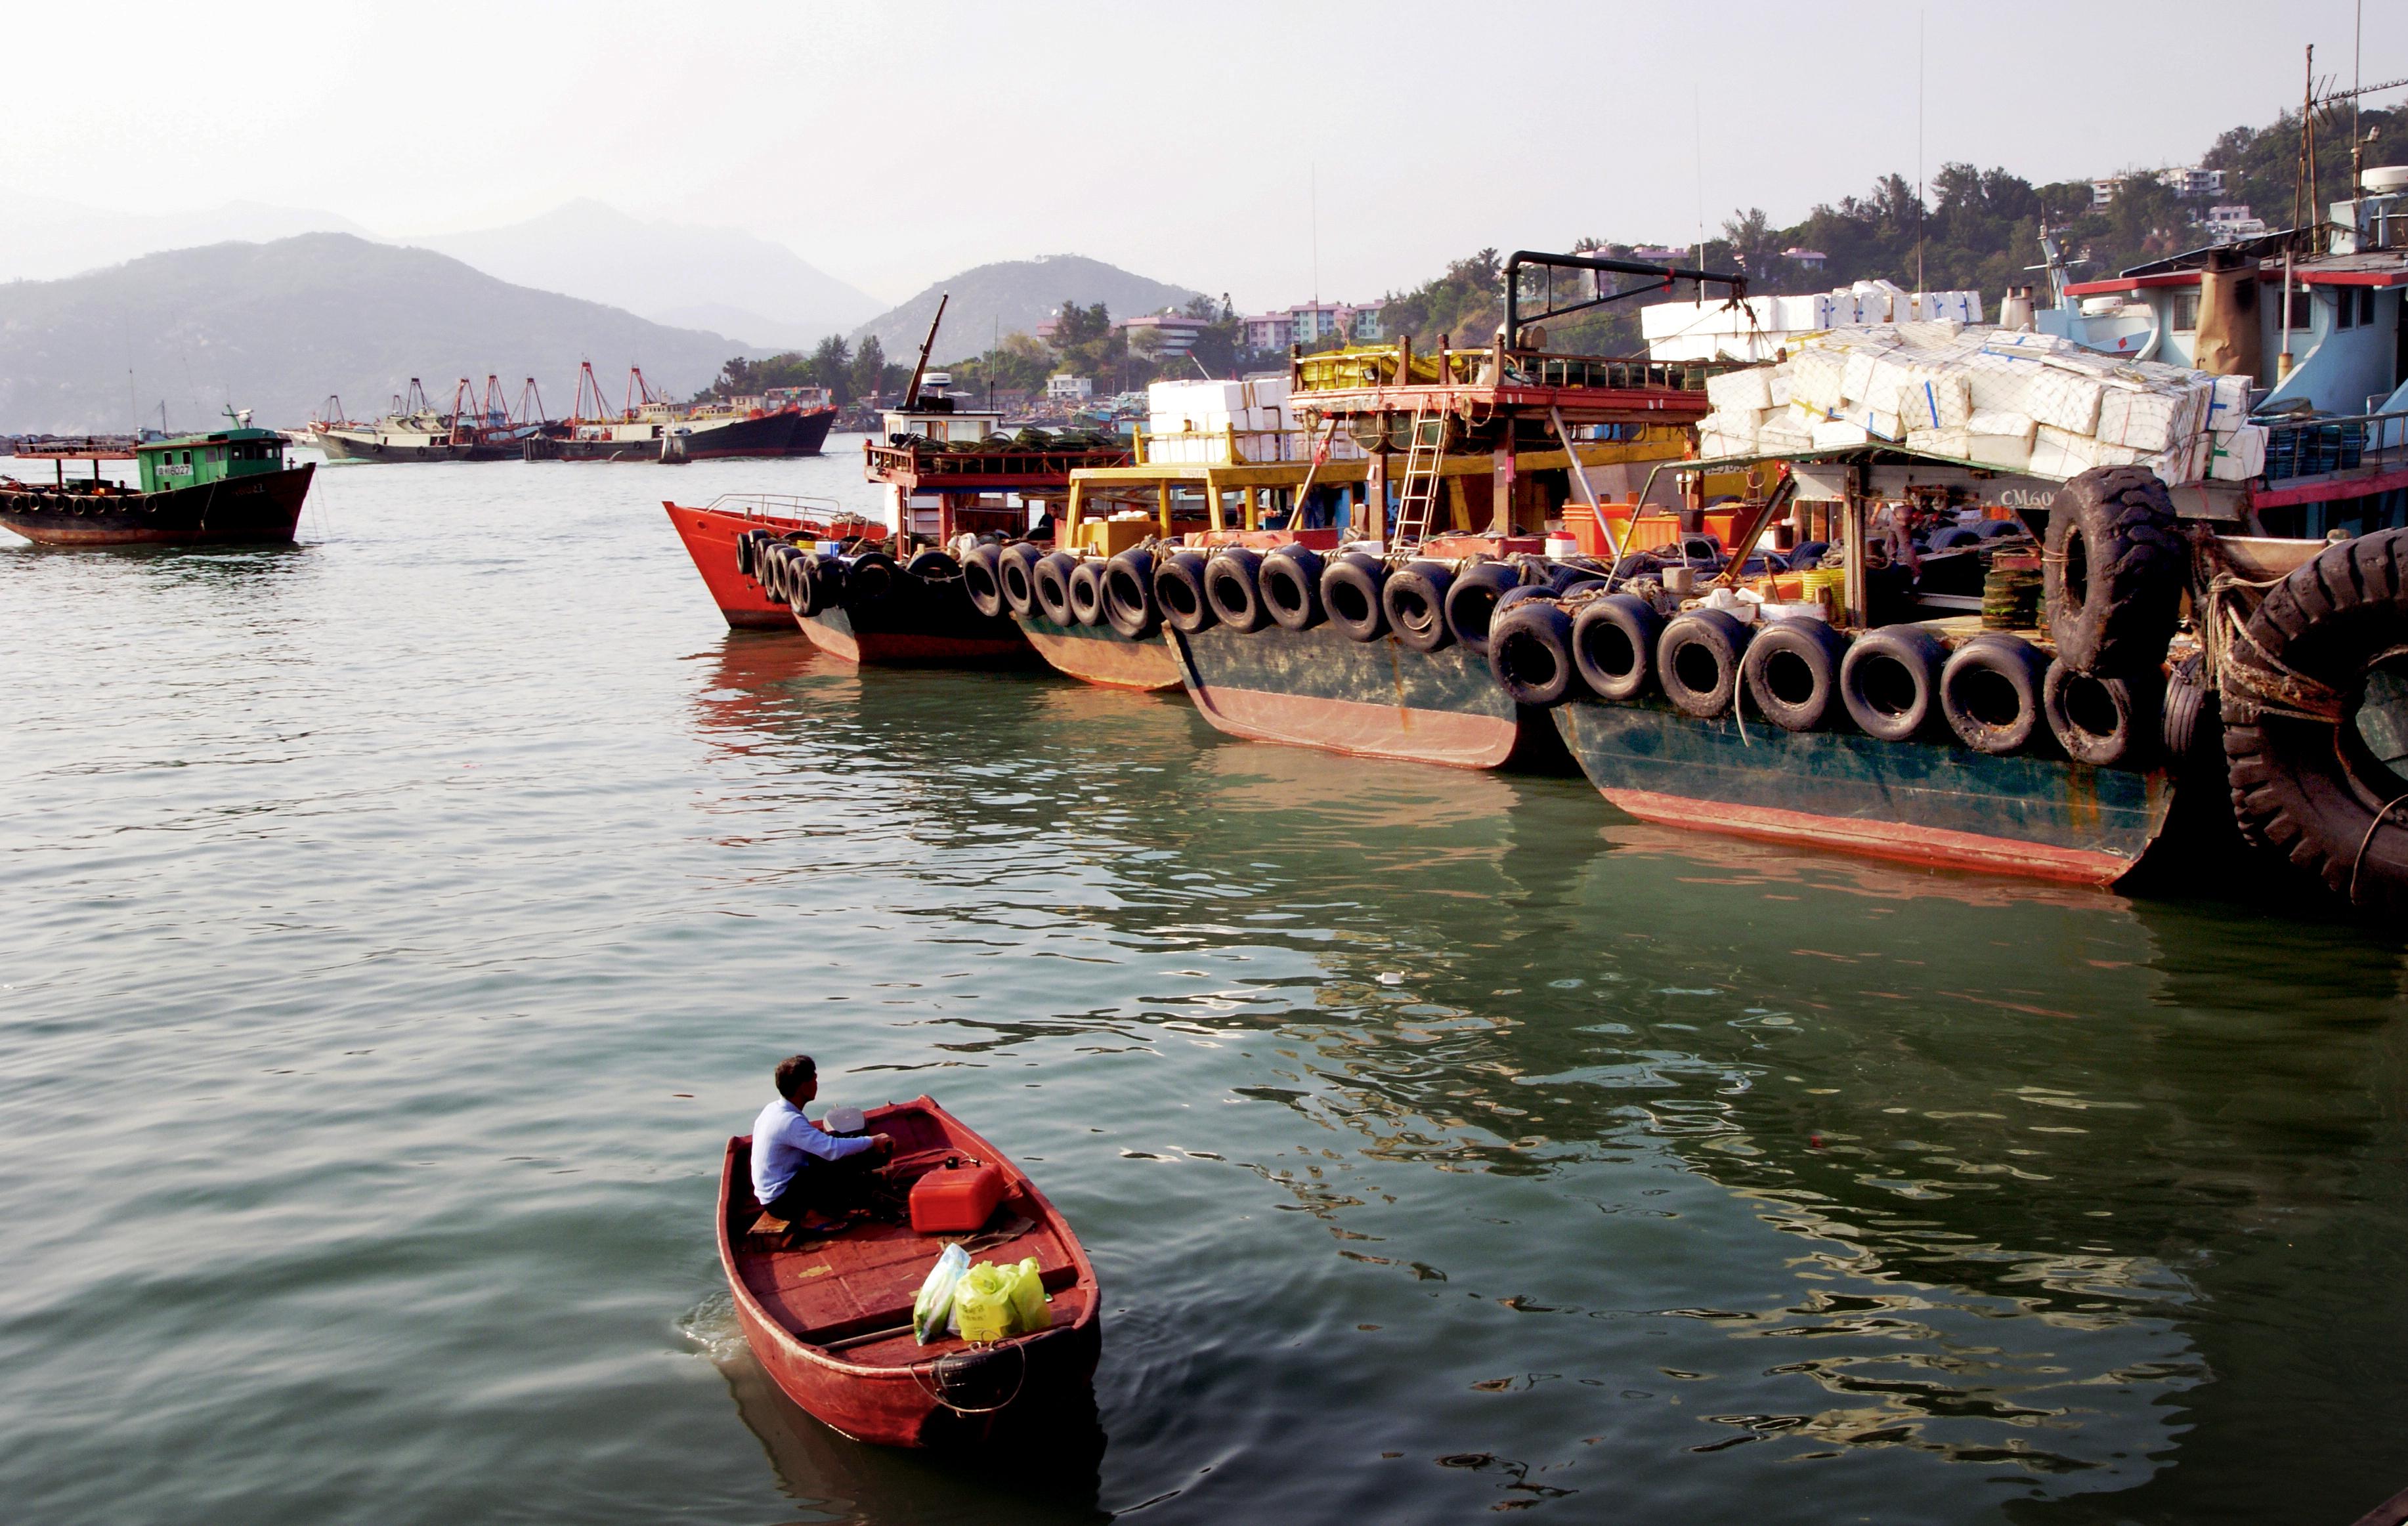 Boatman.Cheung Chau. HK, Boat, Free photos, Geo tagged, Harbour, HQ Photo